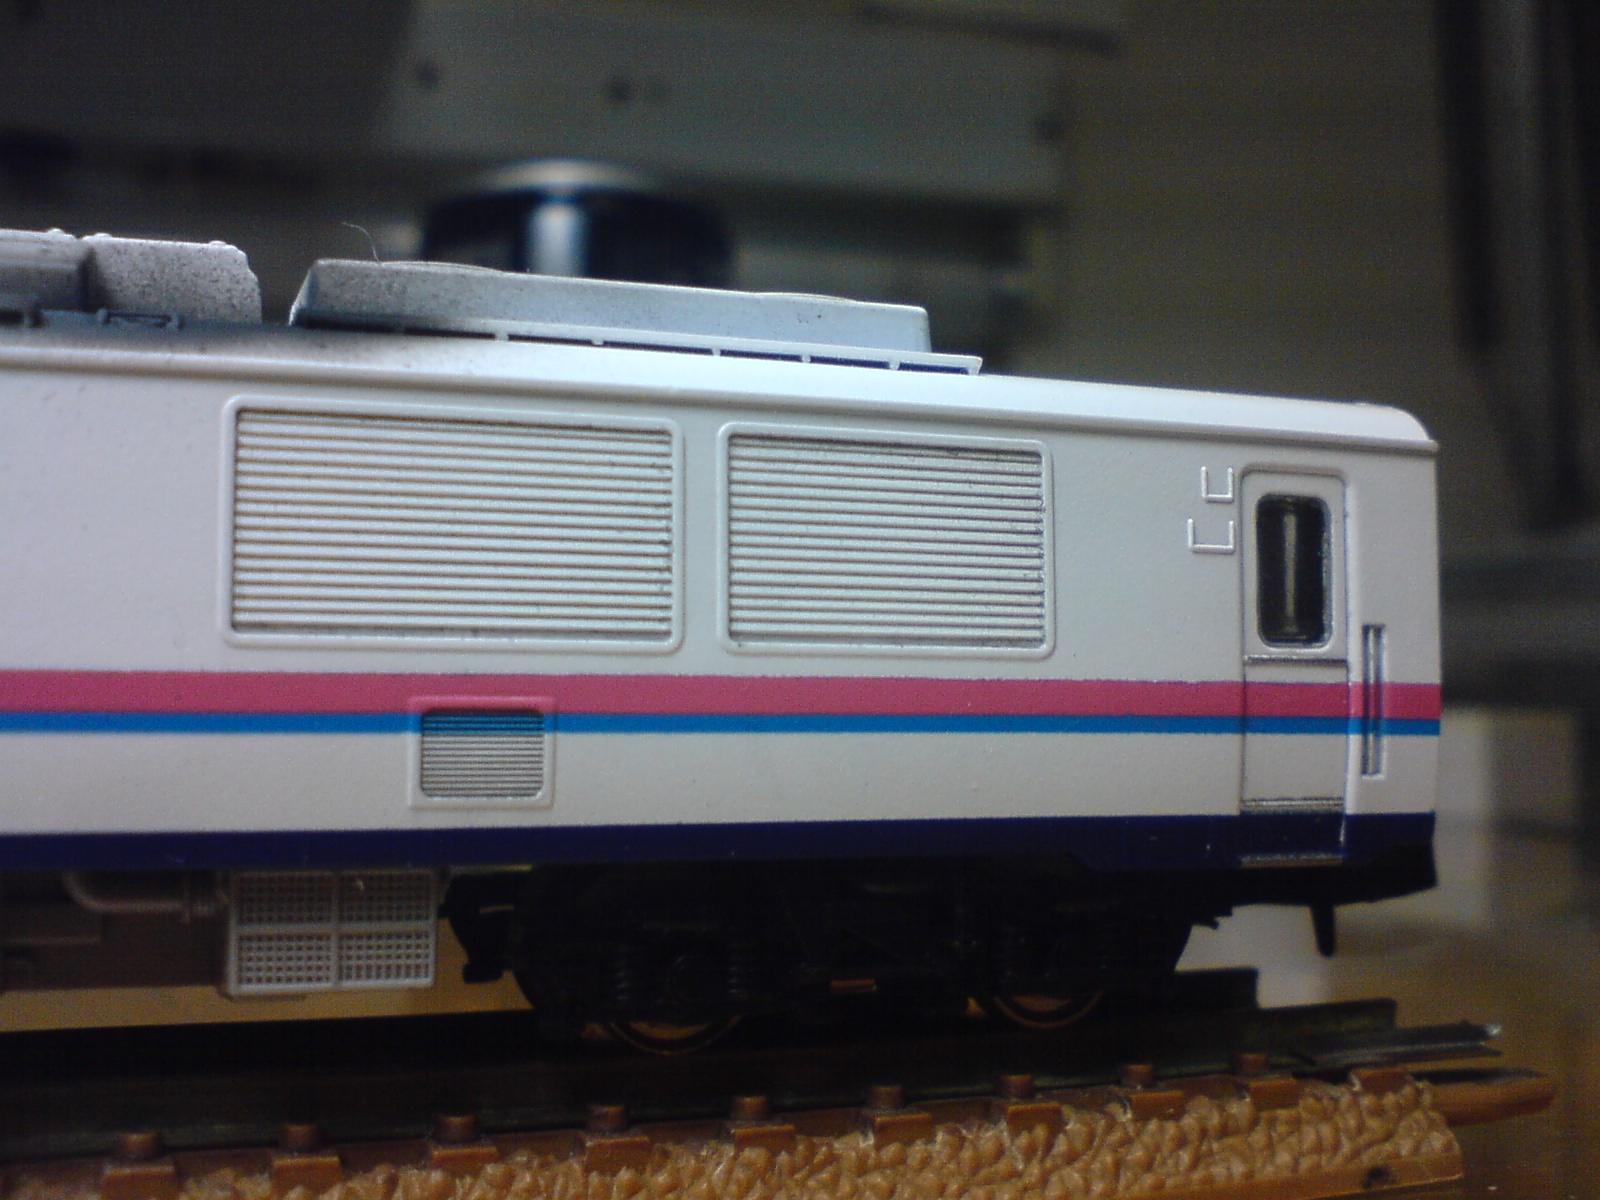 Kc380064